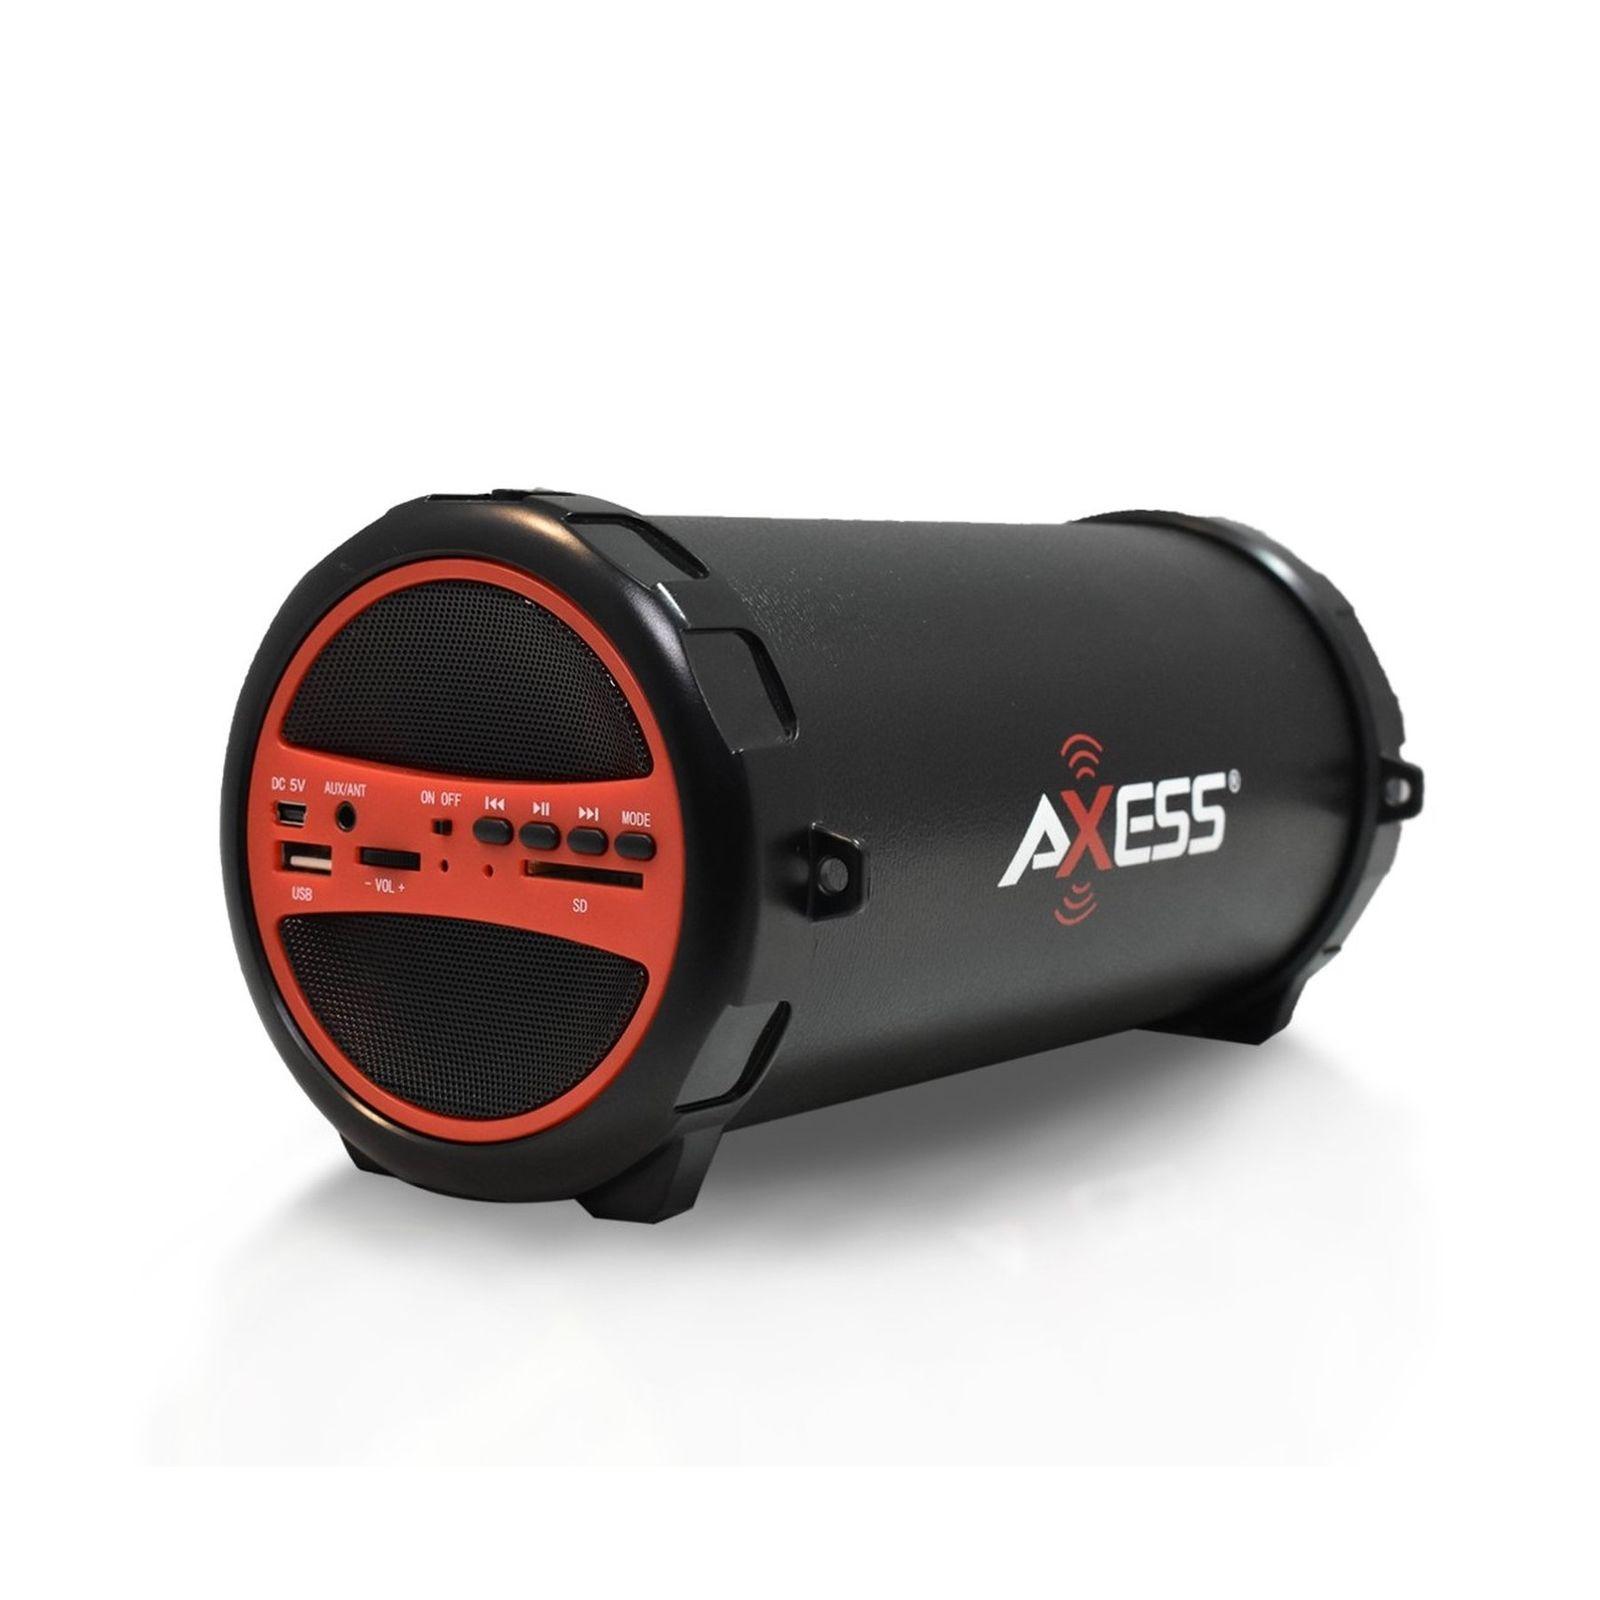 AXESS SPBT1031 Portable Bluetooth Indoor/Outdoor 2.1 Hi-Fi Cylinder Loud Spea...